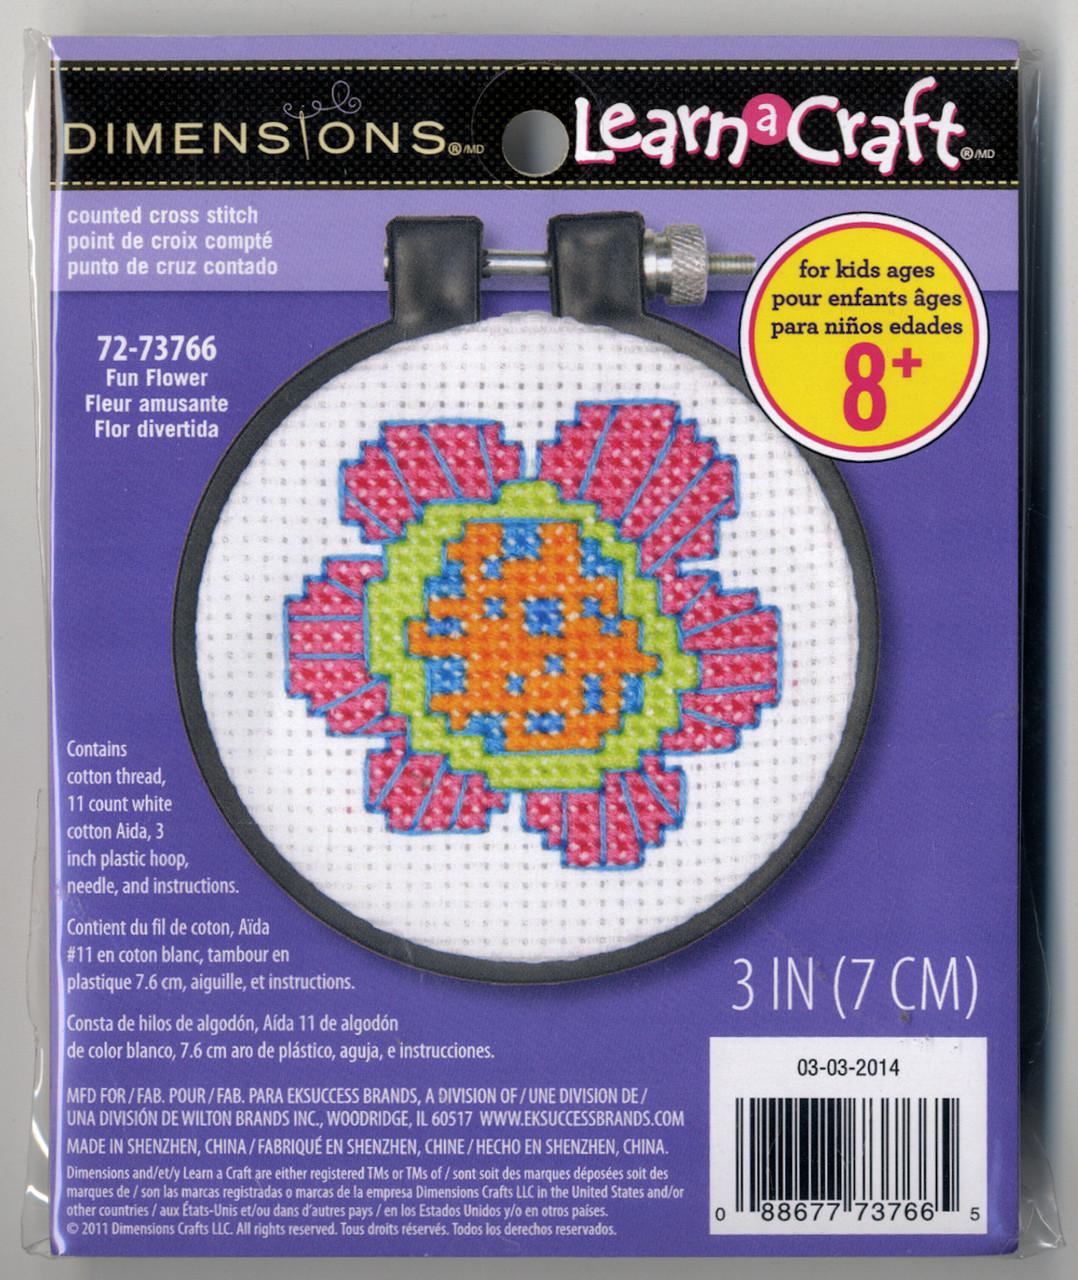 Dimensions Learn a Craft - Fun Flower